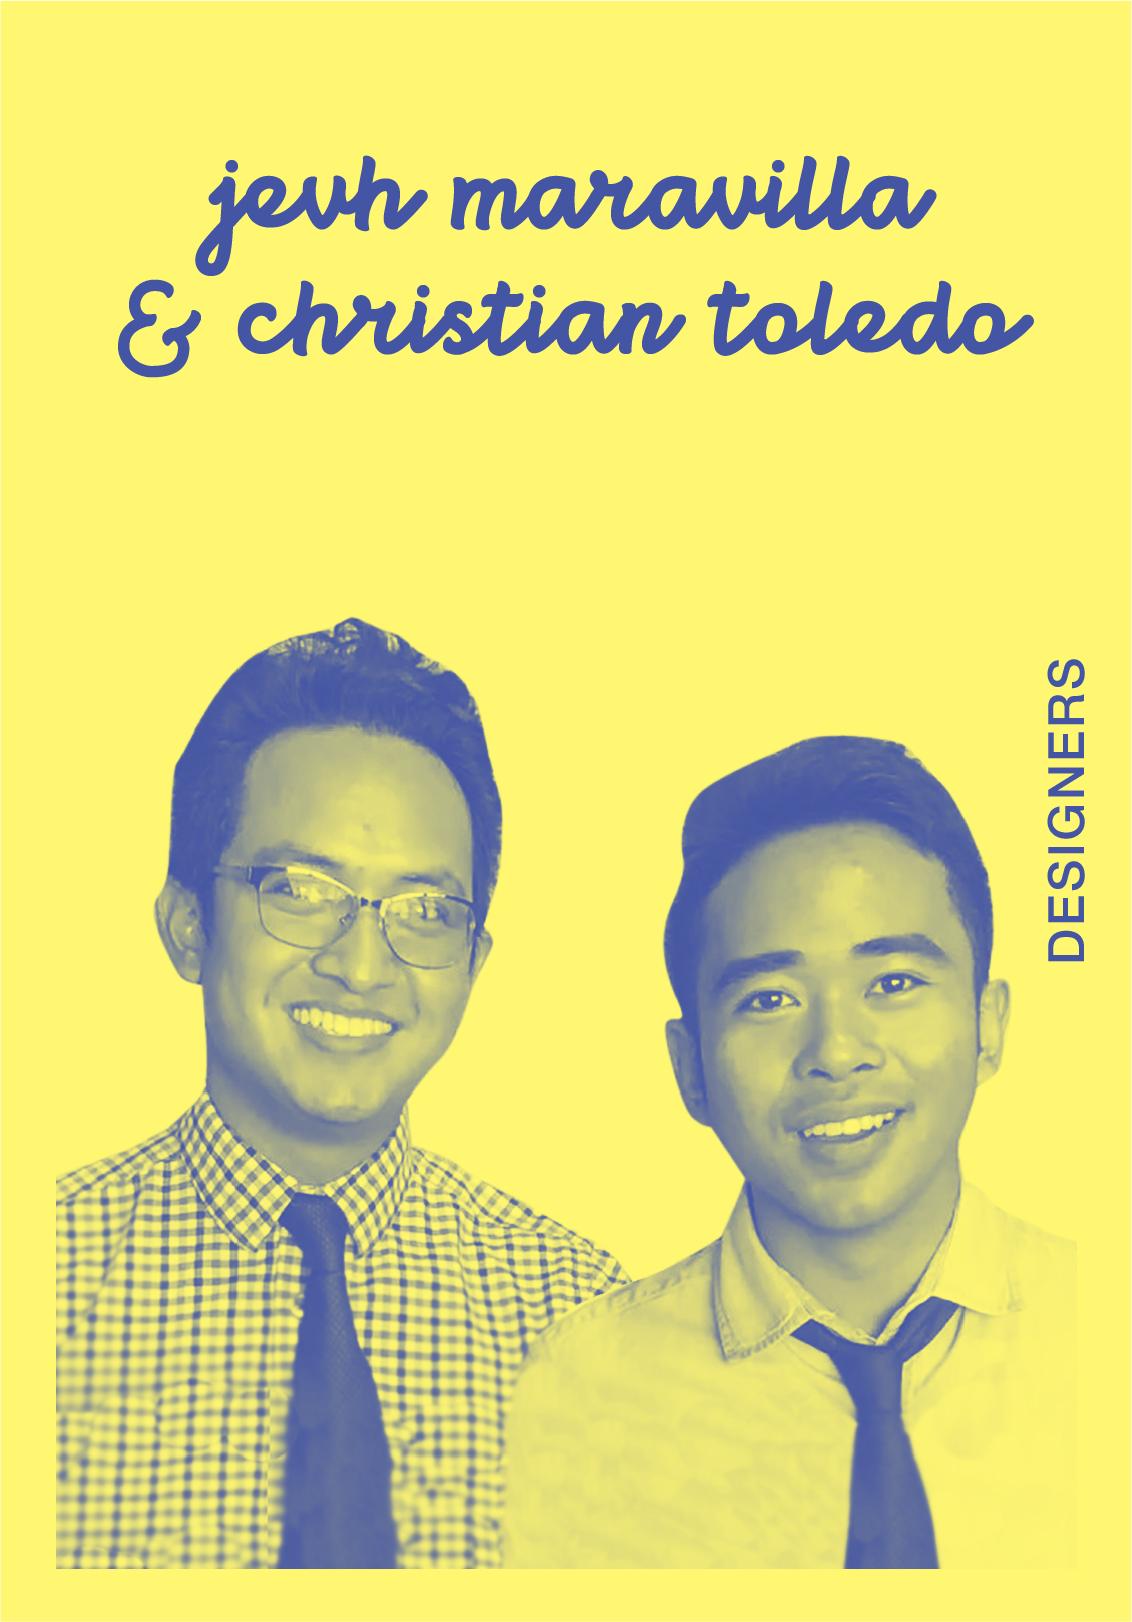 Jevh Maravilla & Christian Toledo   NBC NEWS   TODAY   ELLEN